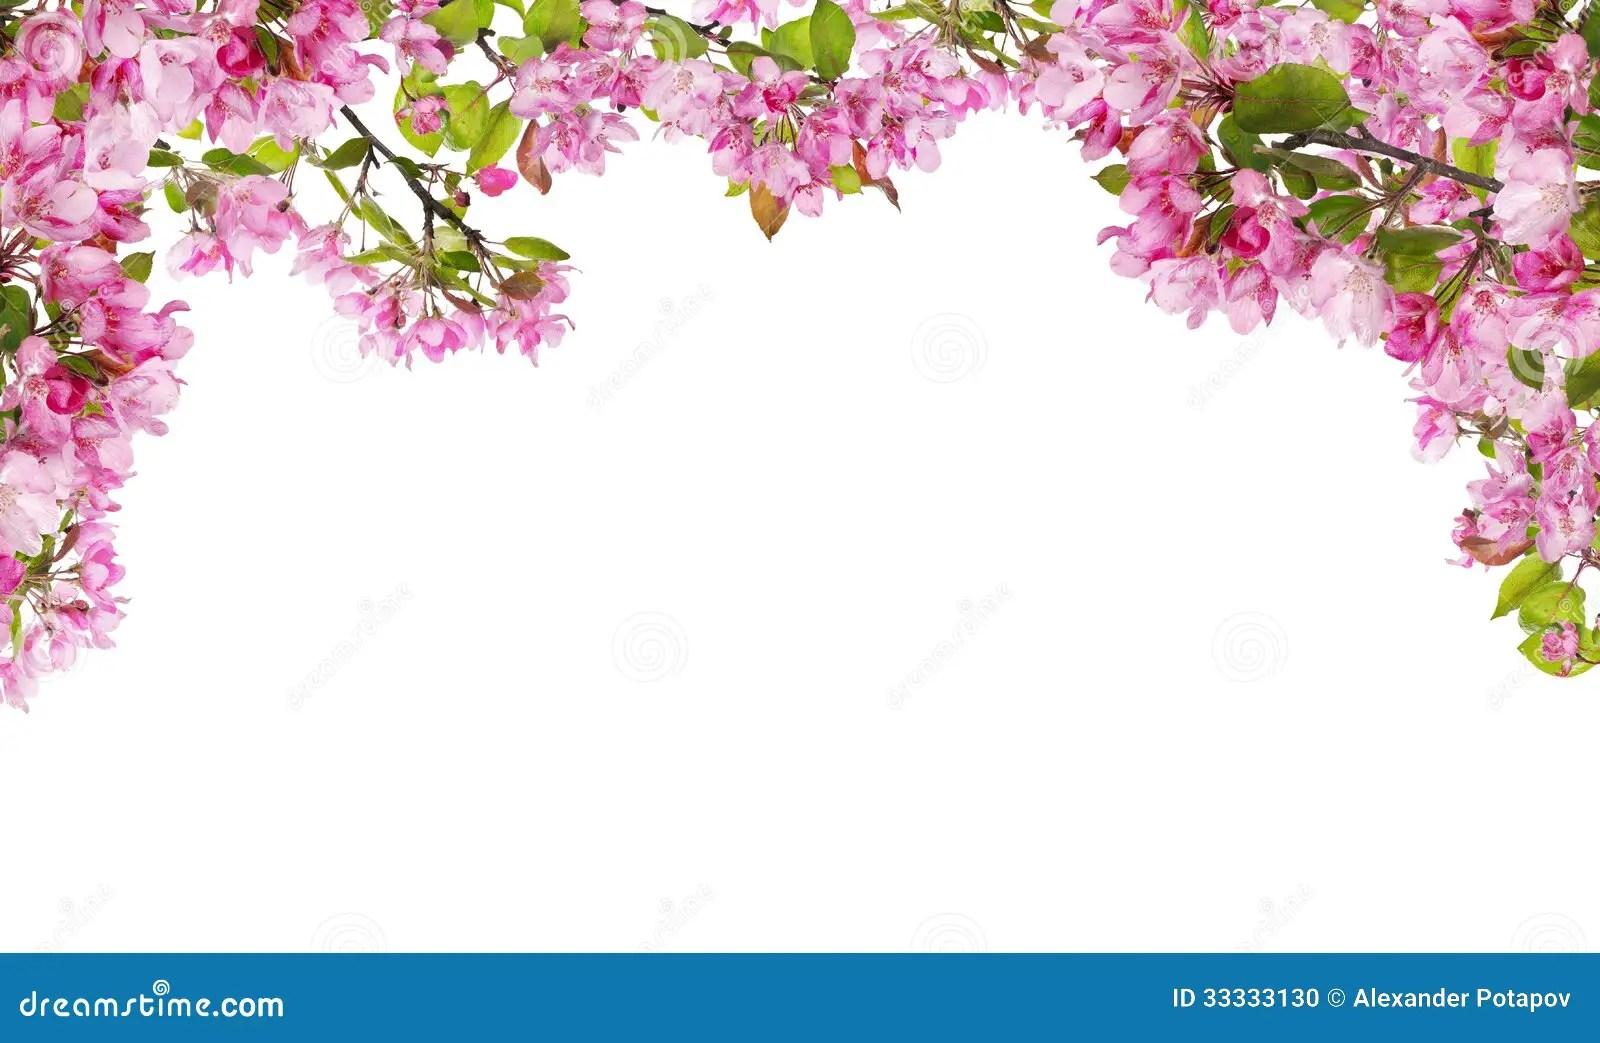 Falling Rose Petals Live Wallpaper Apfelbaum Rosablume Verzweigt Sich Halber Rahmen Stockfoto